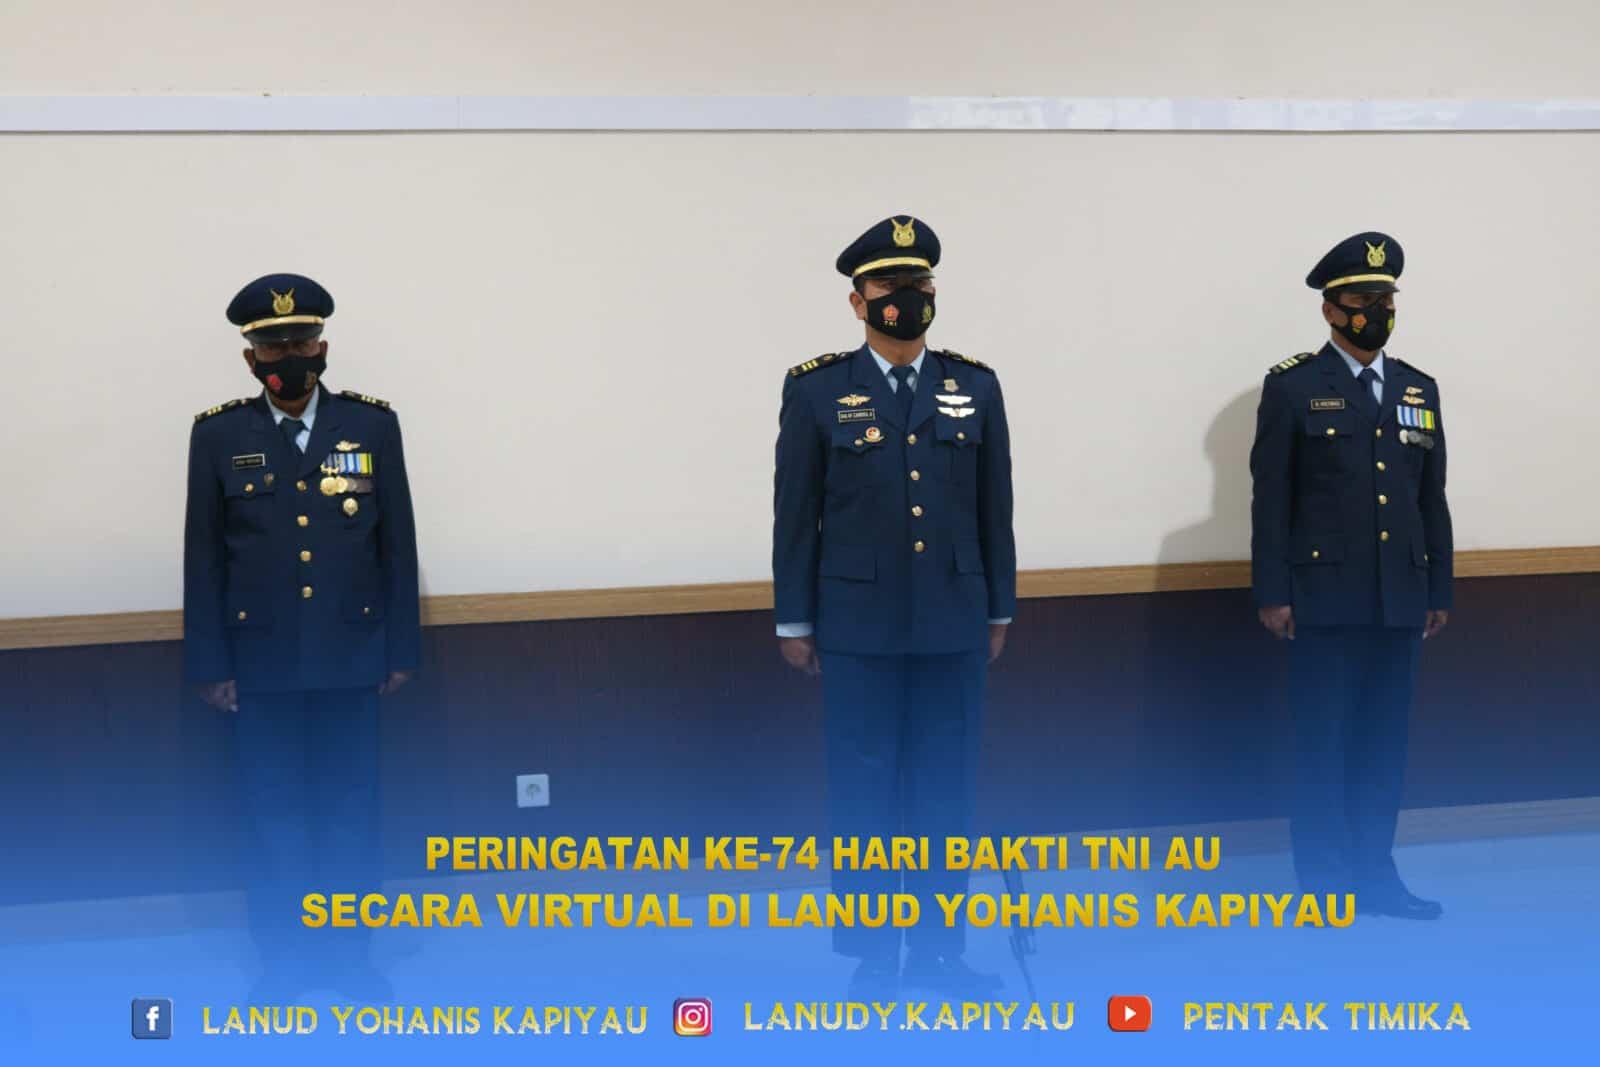 Peringatan ke-74 Hari Bakti TNI AU Secara Virtual Di Lanud Yohanis Kapiyau